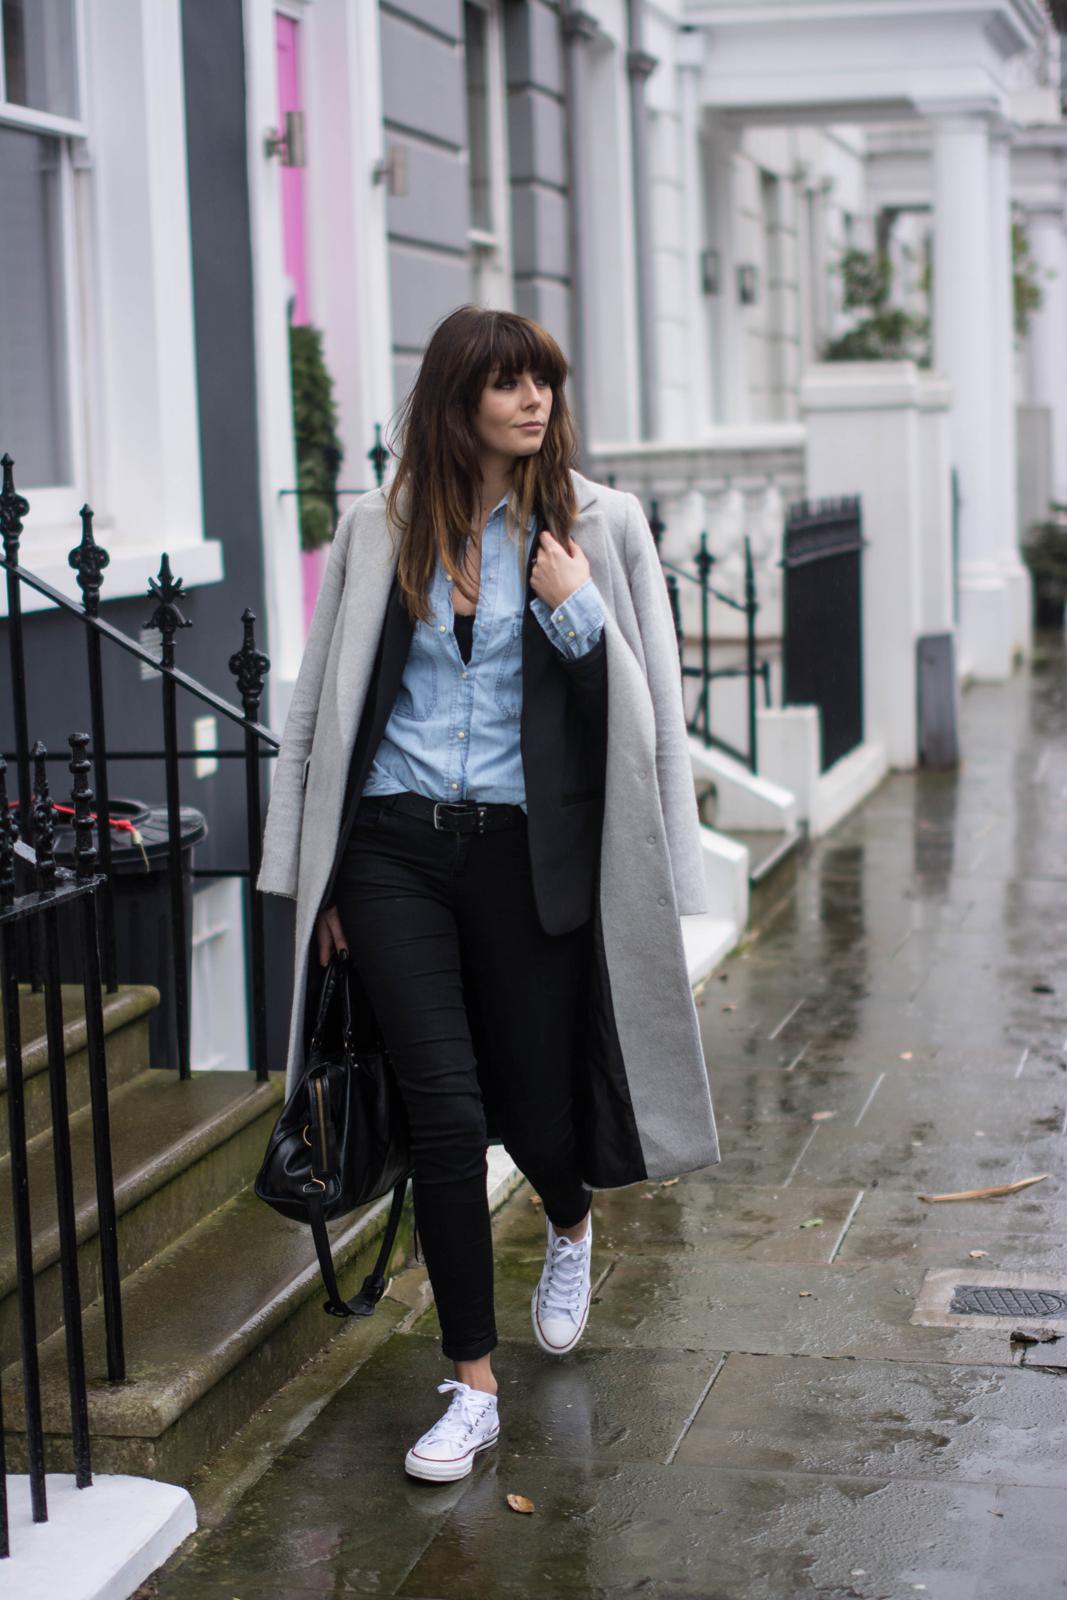 EJSTYLE - Emma Hill, Dorothy Perkins long grey boyfriend coat, black skinny jeans, denim shirt, black blazer, converse chuck taylor low white, fashion blogger, OOTD, street style